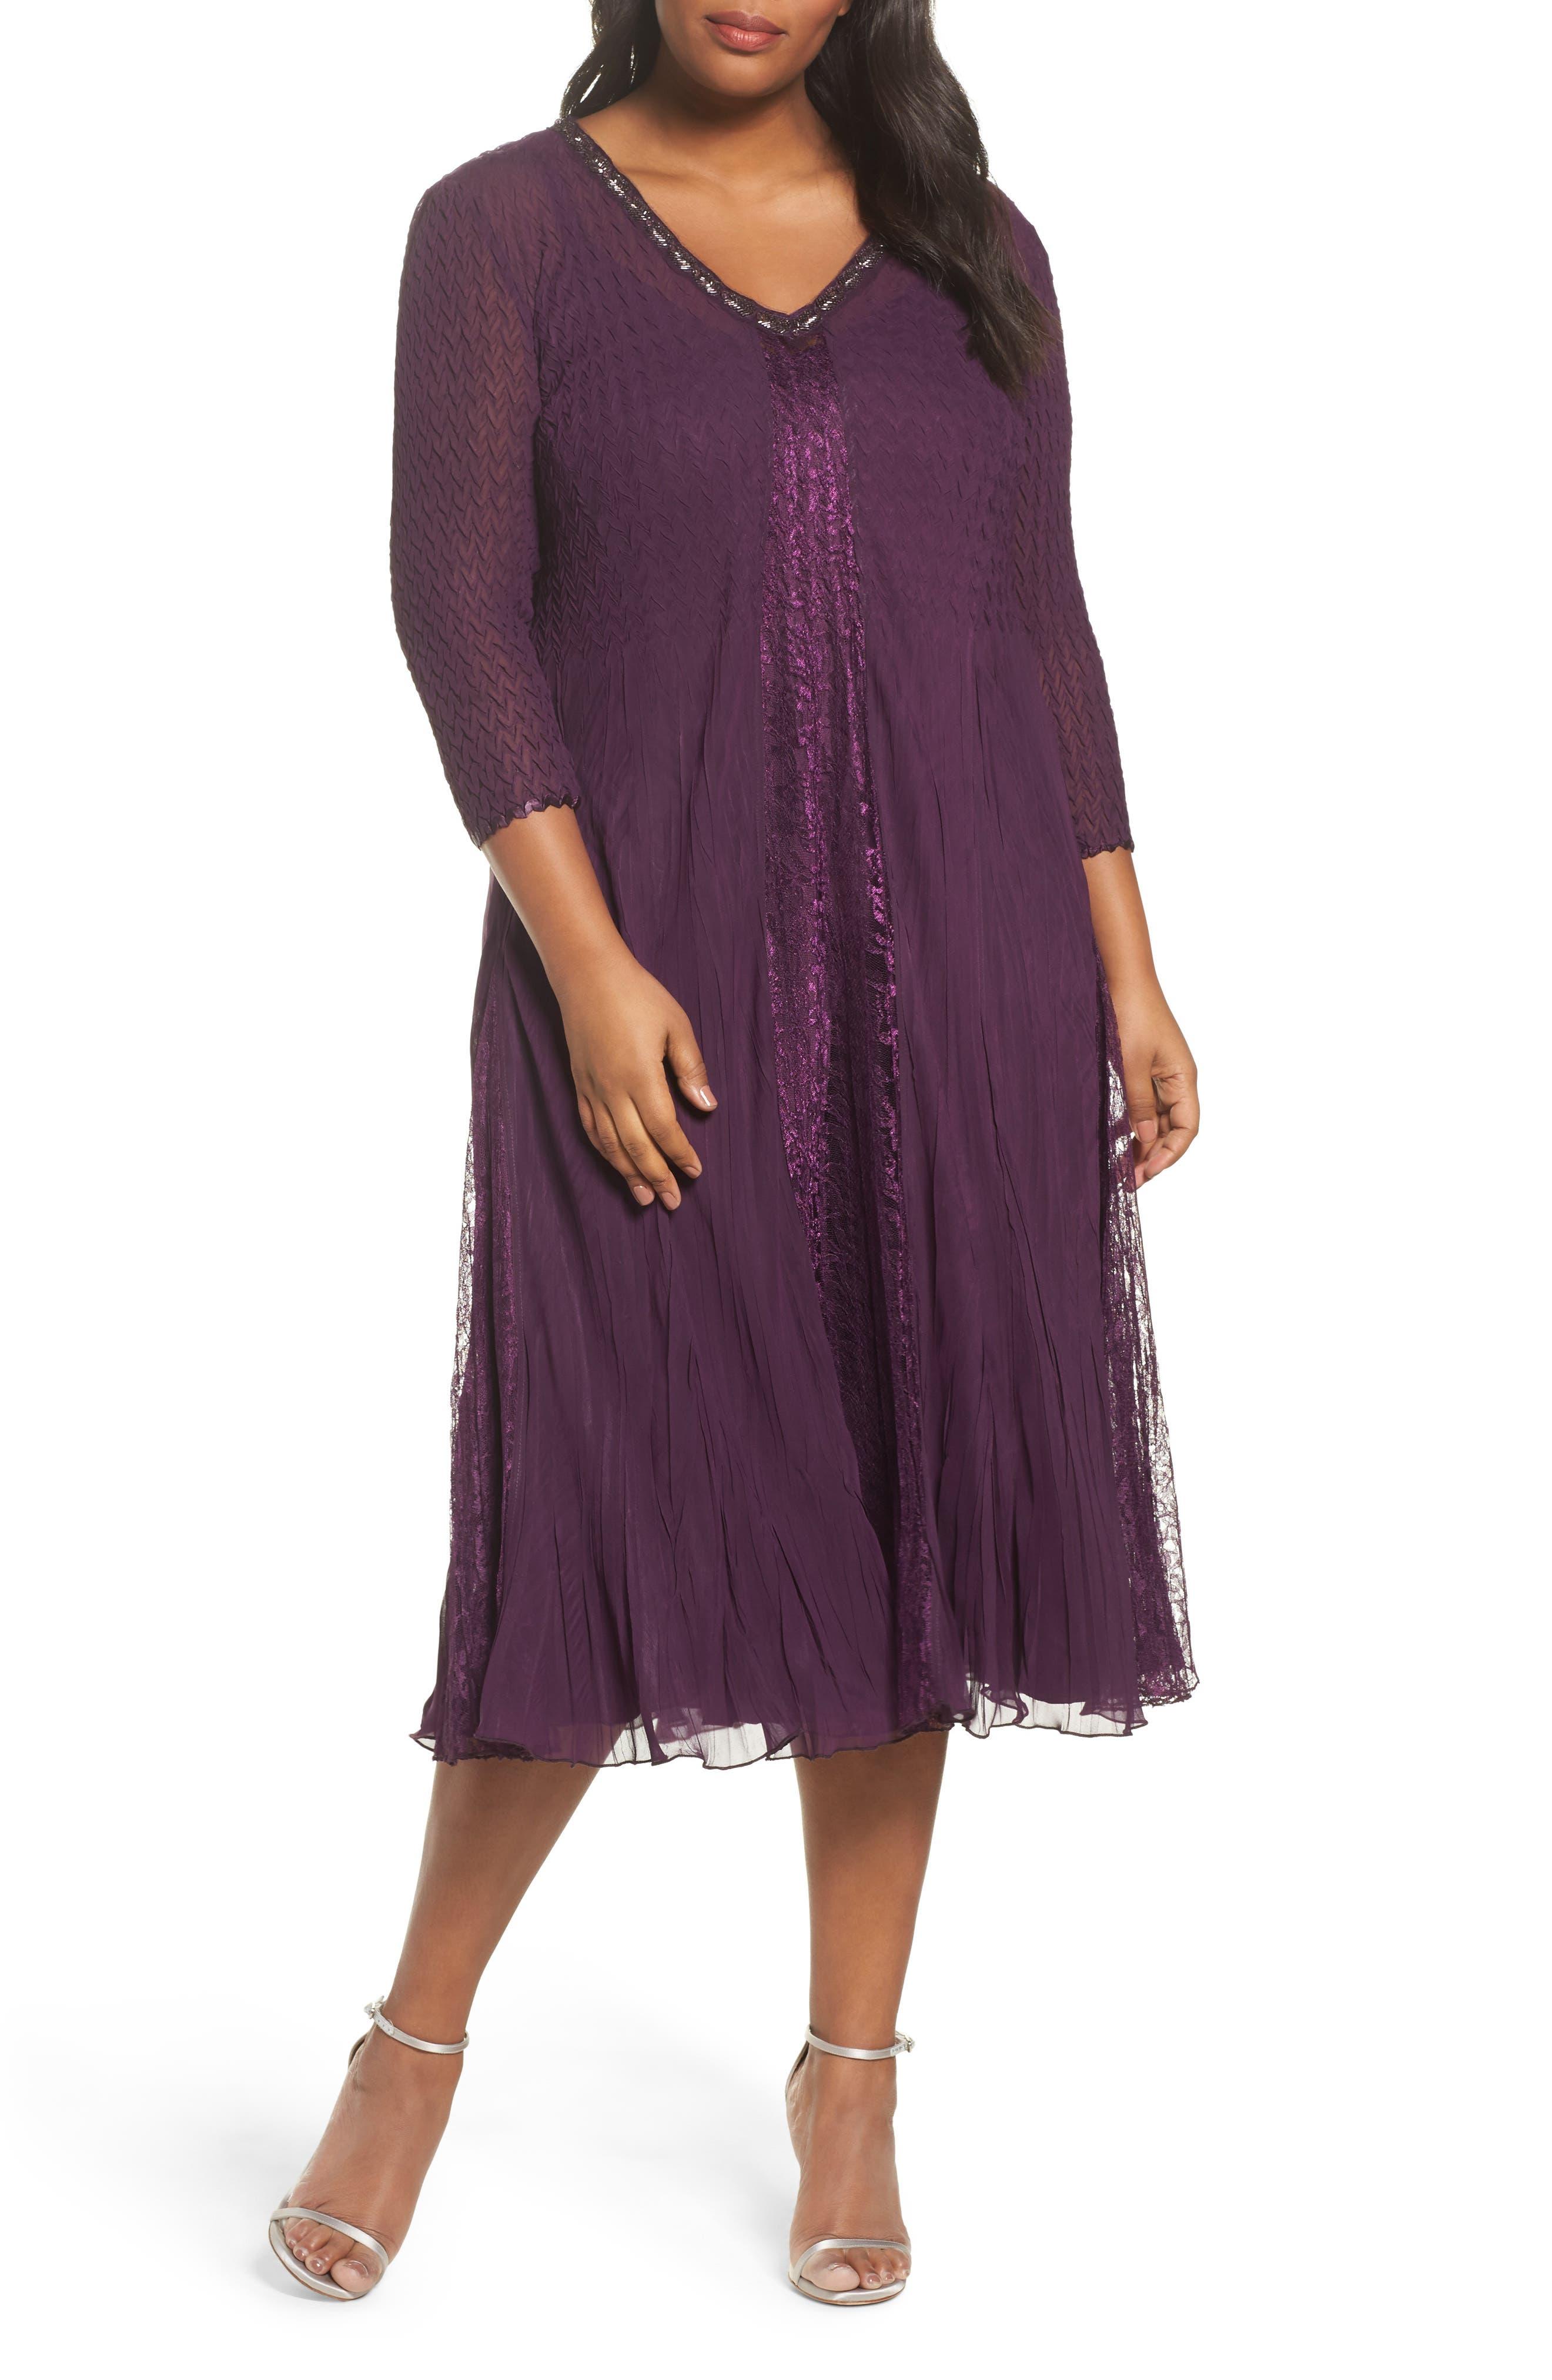 Alternate Image 1 Selected - Komarov Center Front Lace Dress (Plus Size)